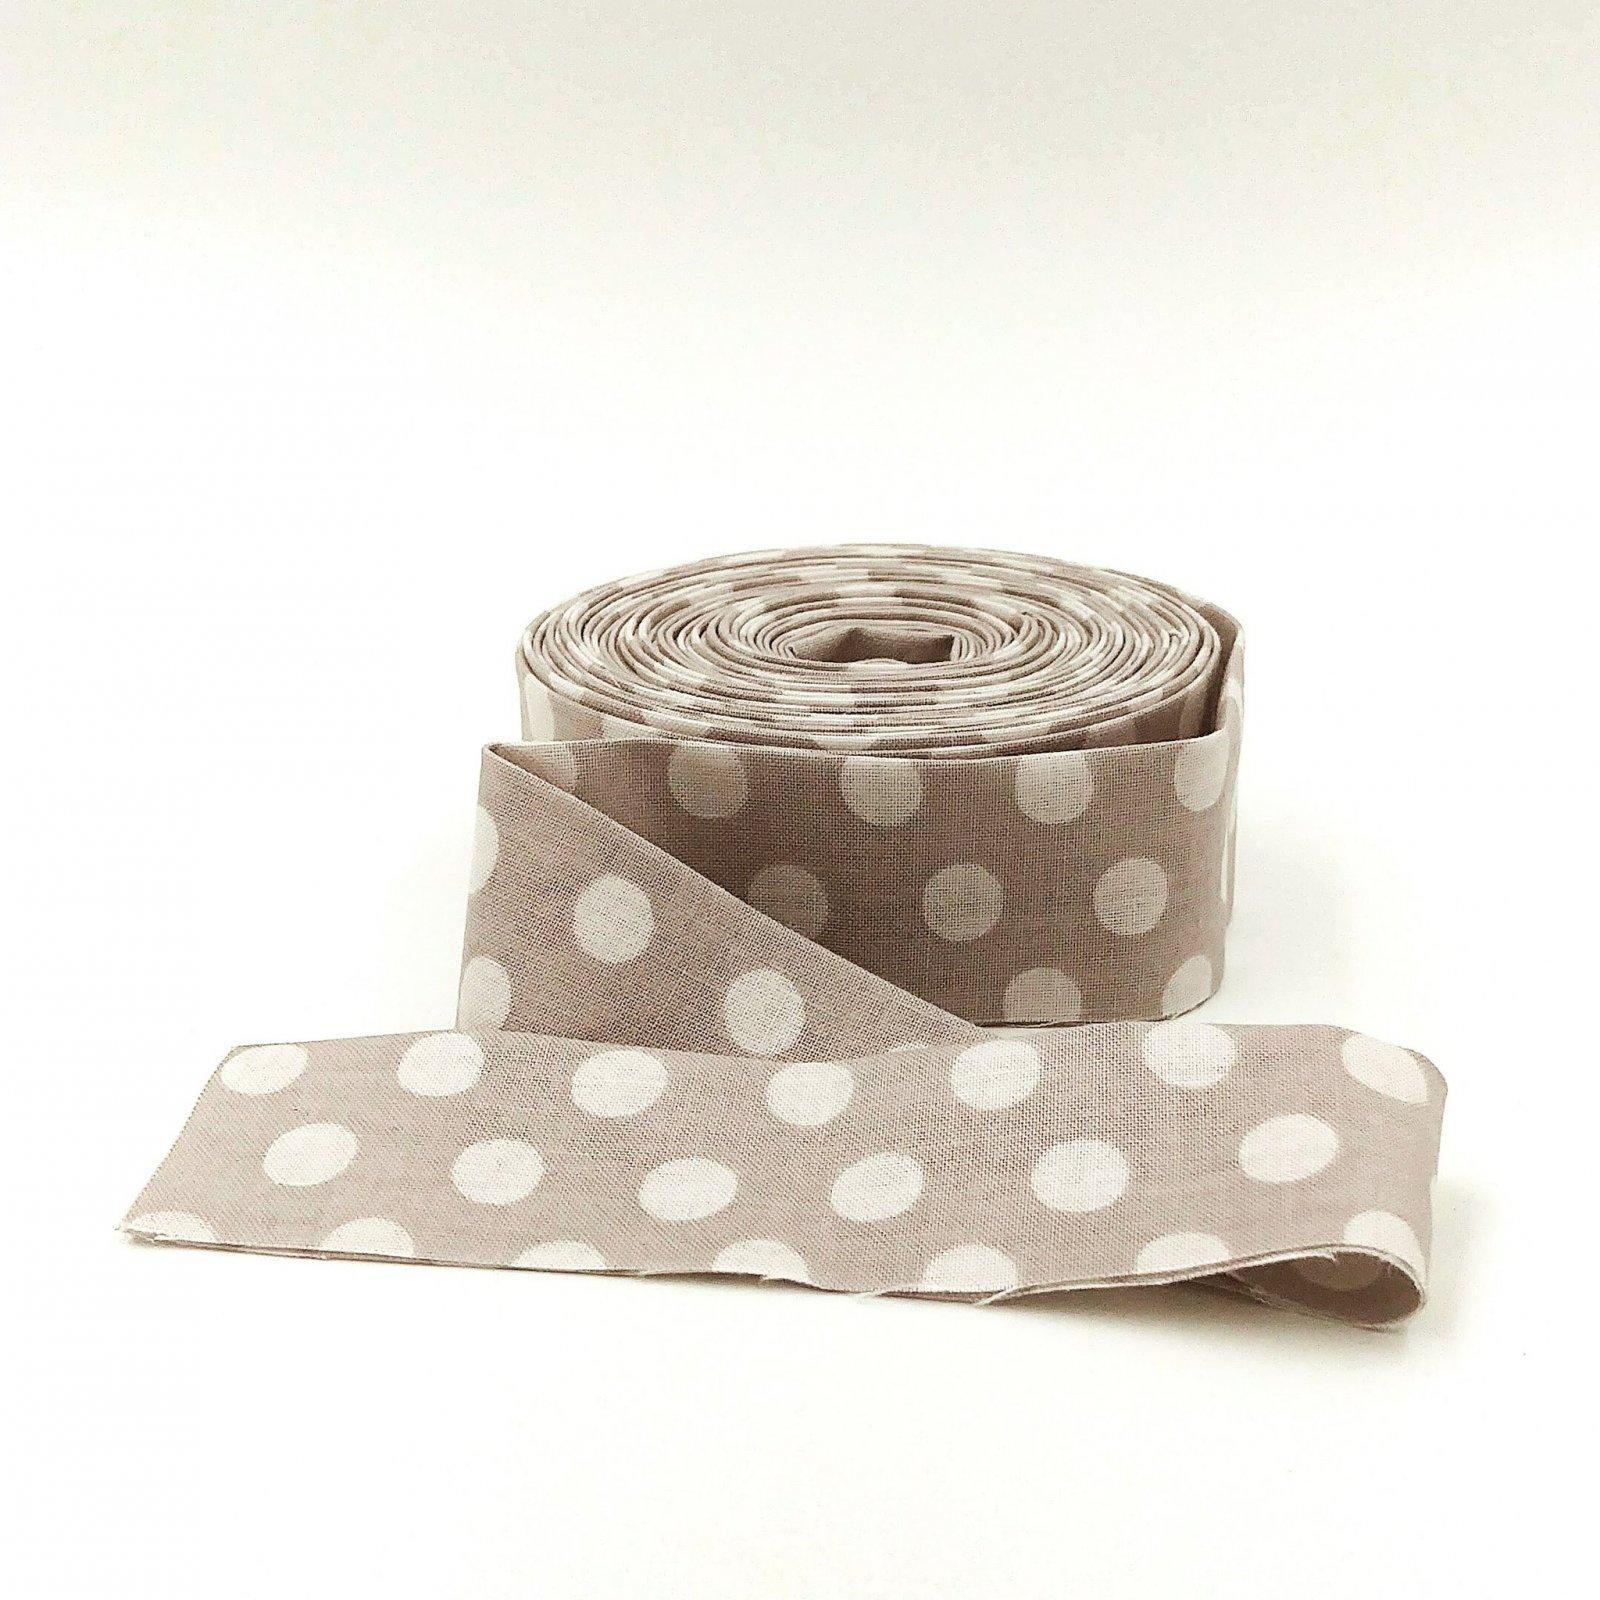 Binding Spots Gray by Kaffe Fassett